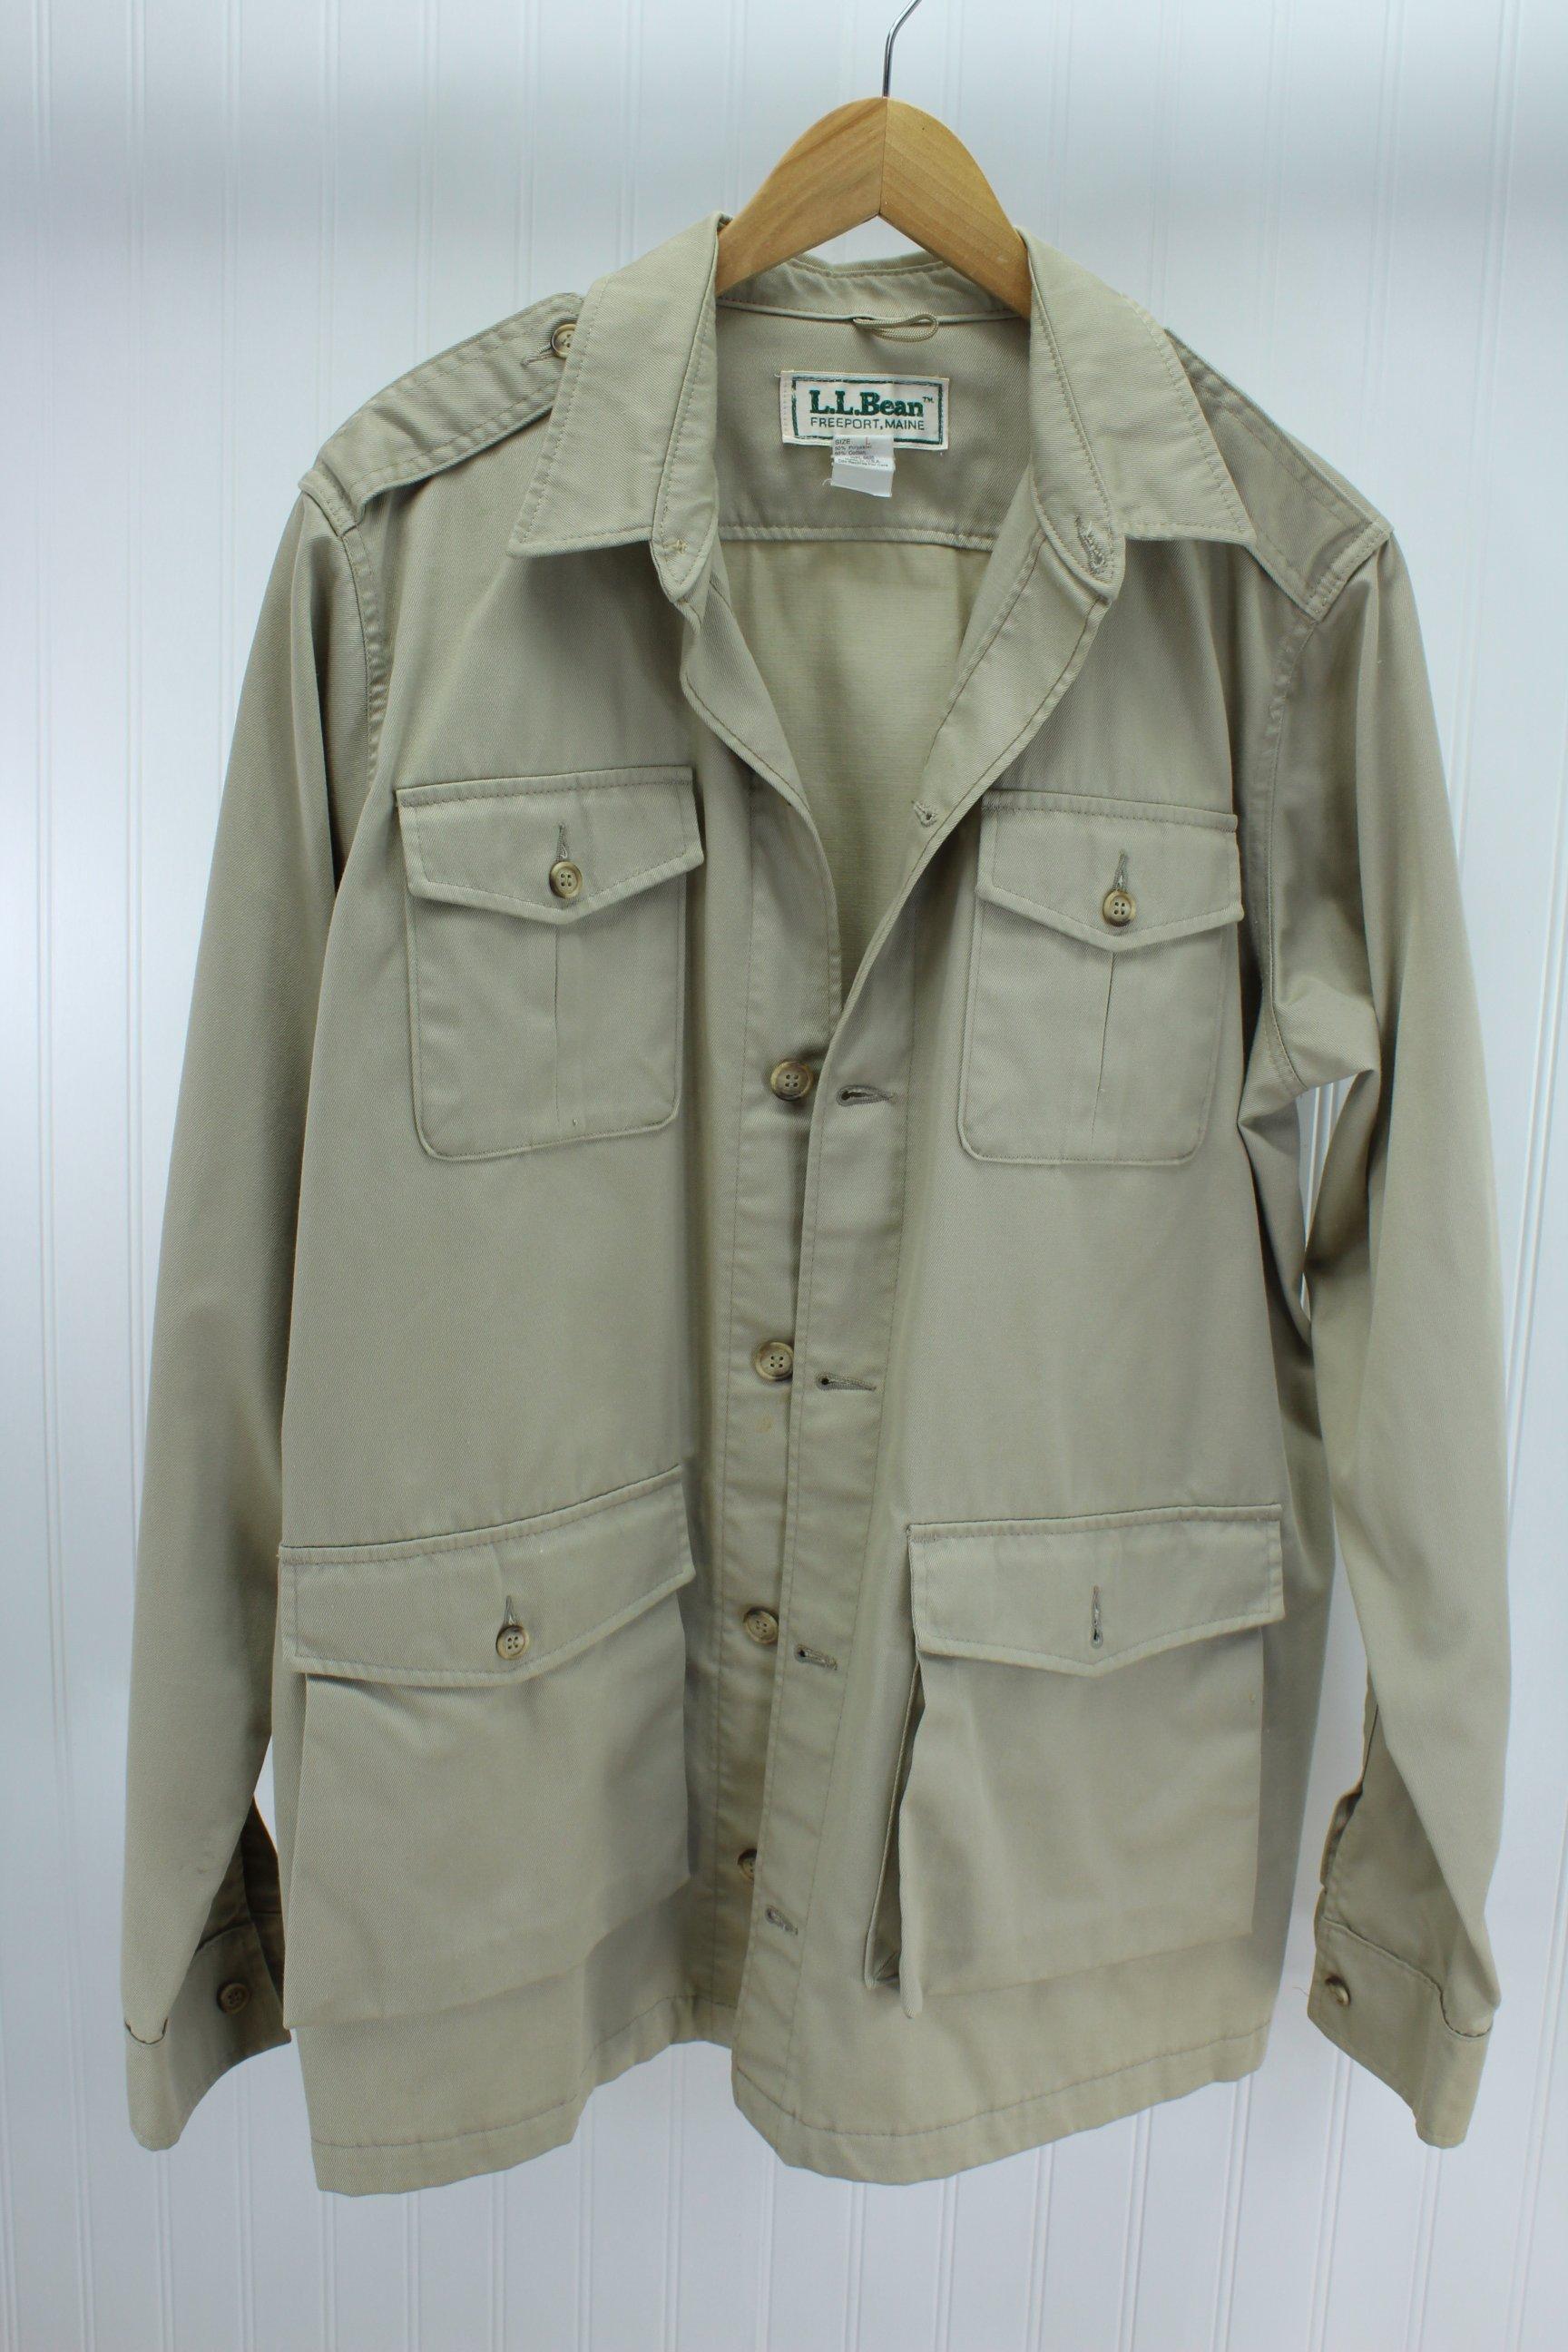 8728d26275dc3 L L Bean Khaki Safari Jacket Unlined Vintage Mens Large Long Cotton Poly  Twill